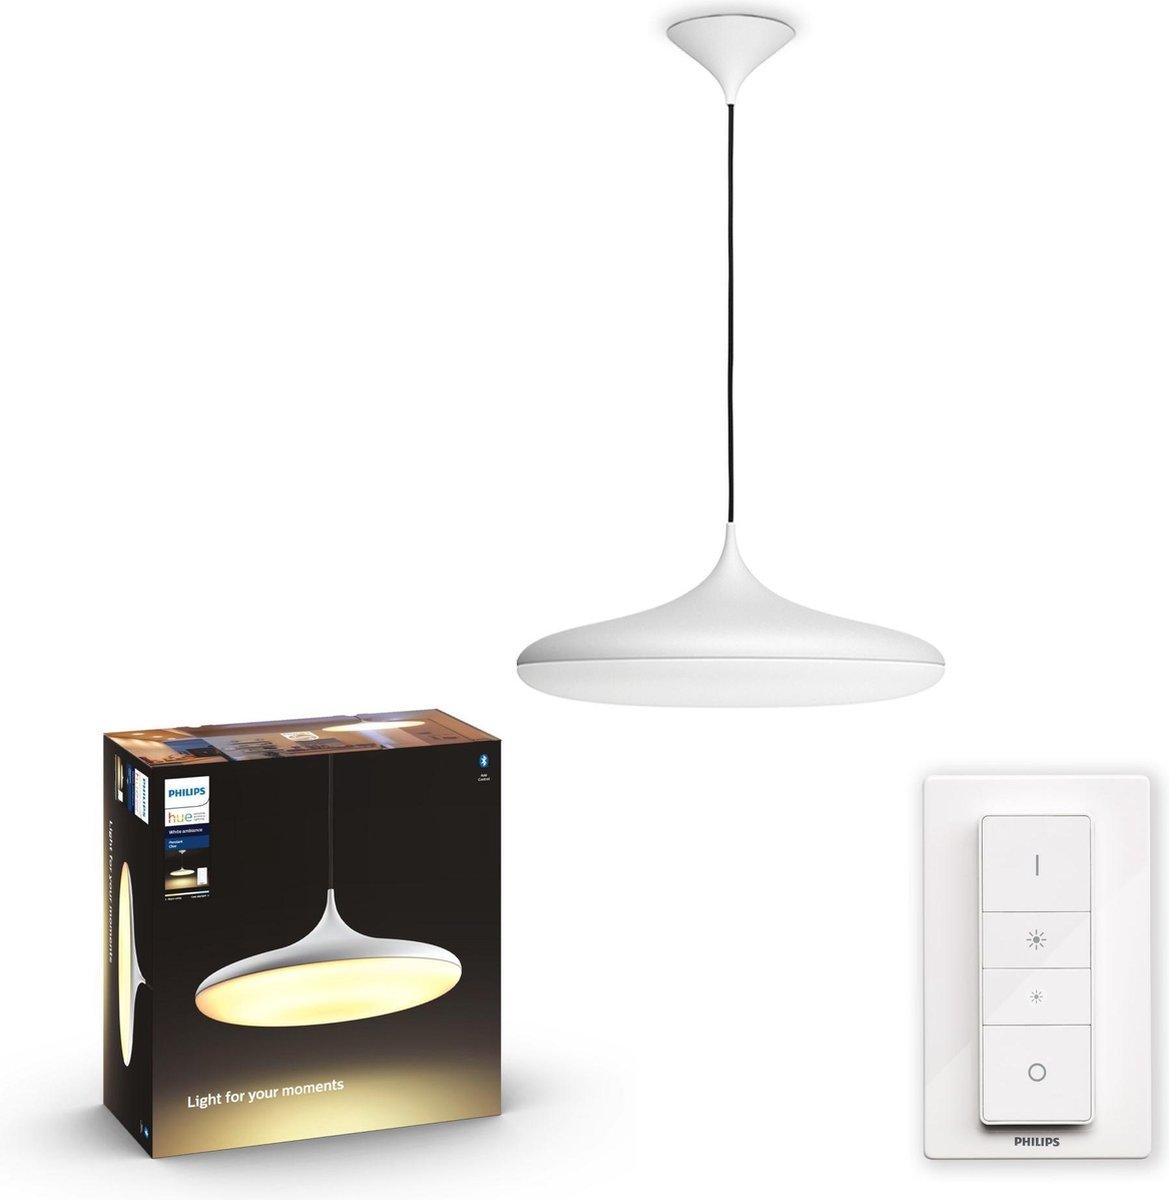 Philips Hue - Cher Hue Pendant White - White Ambiance Bluetooth